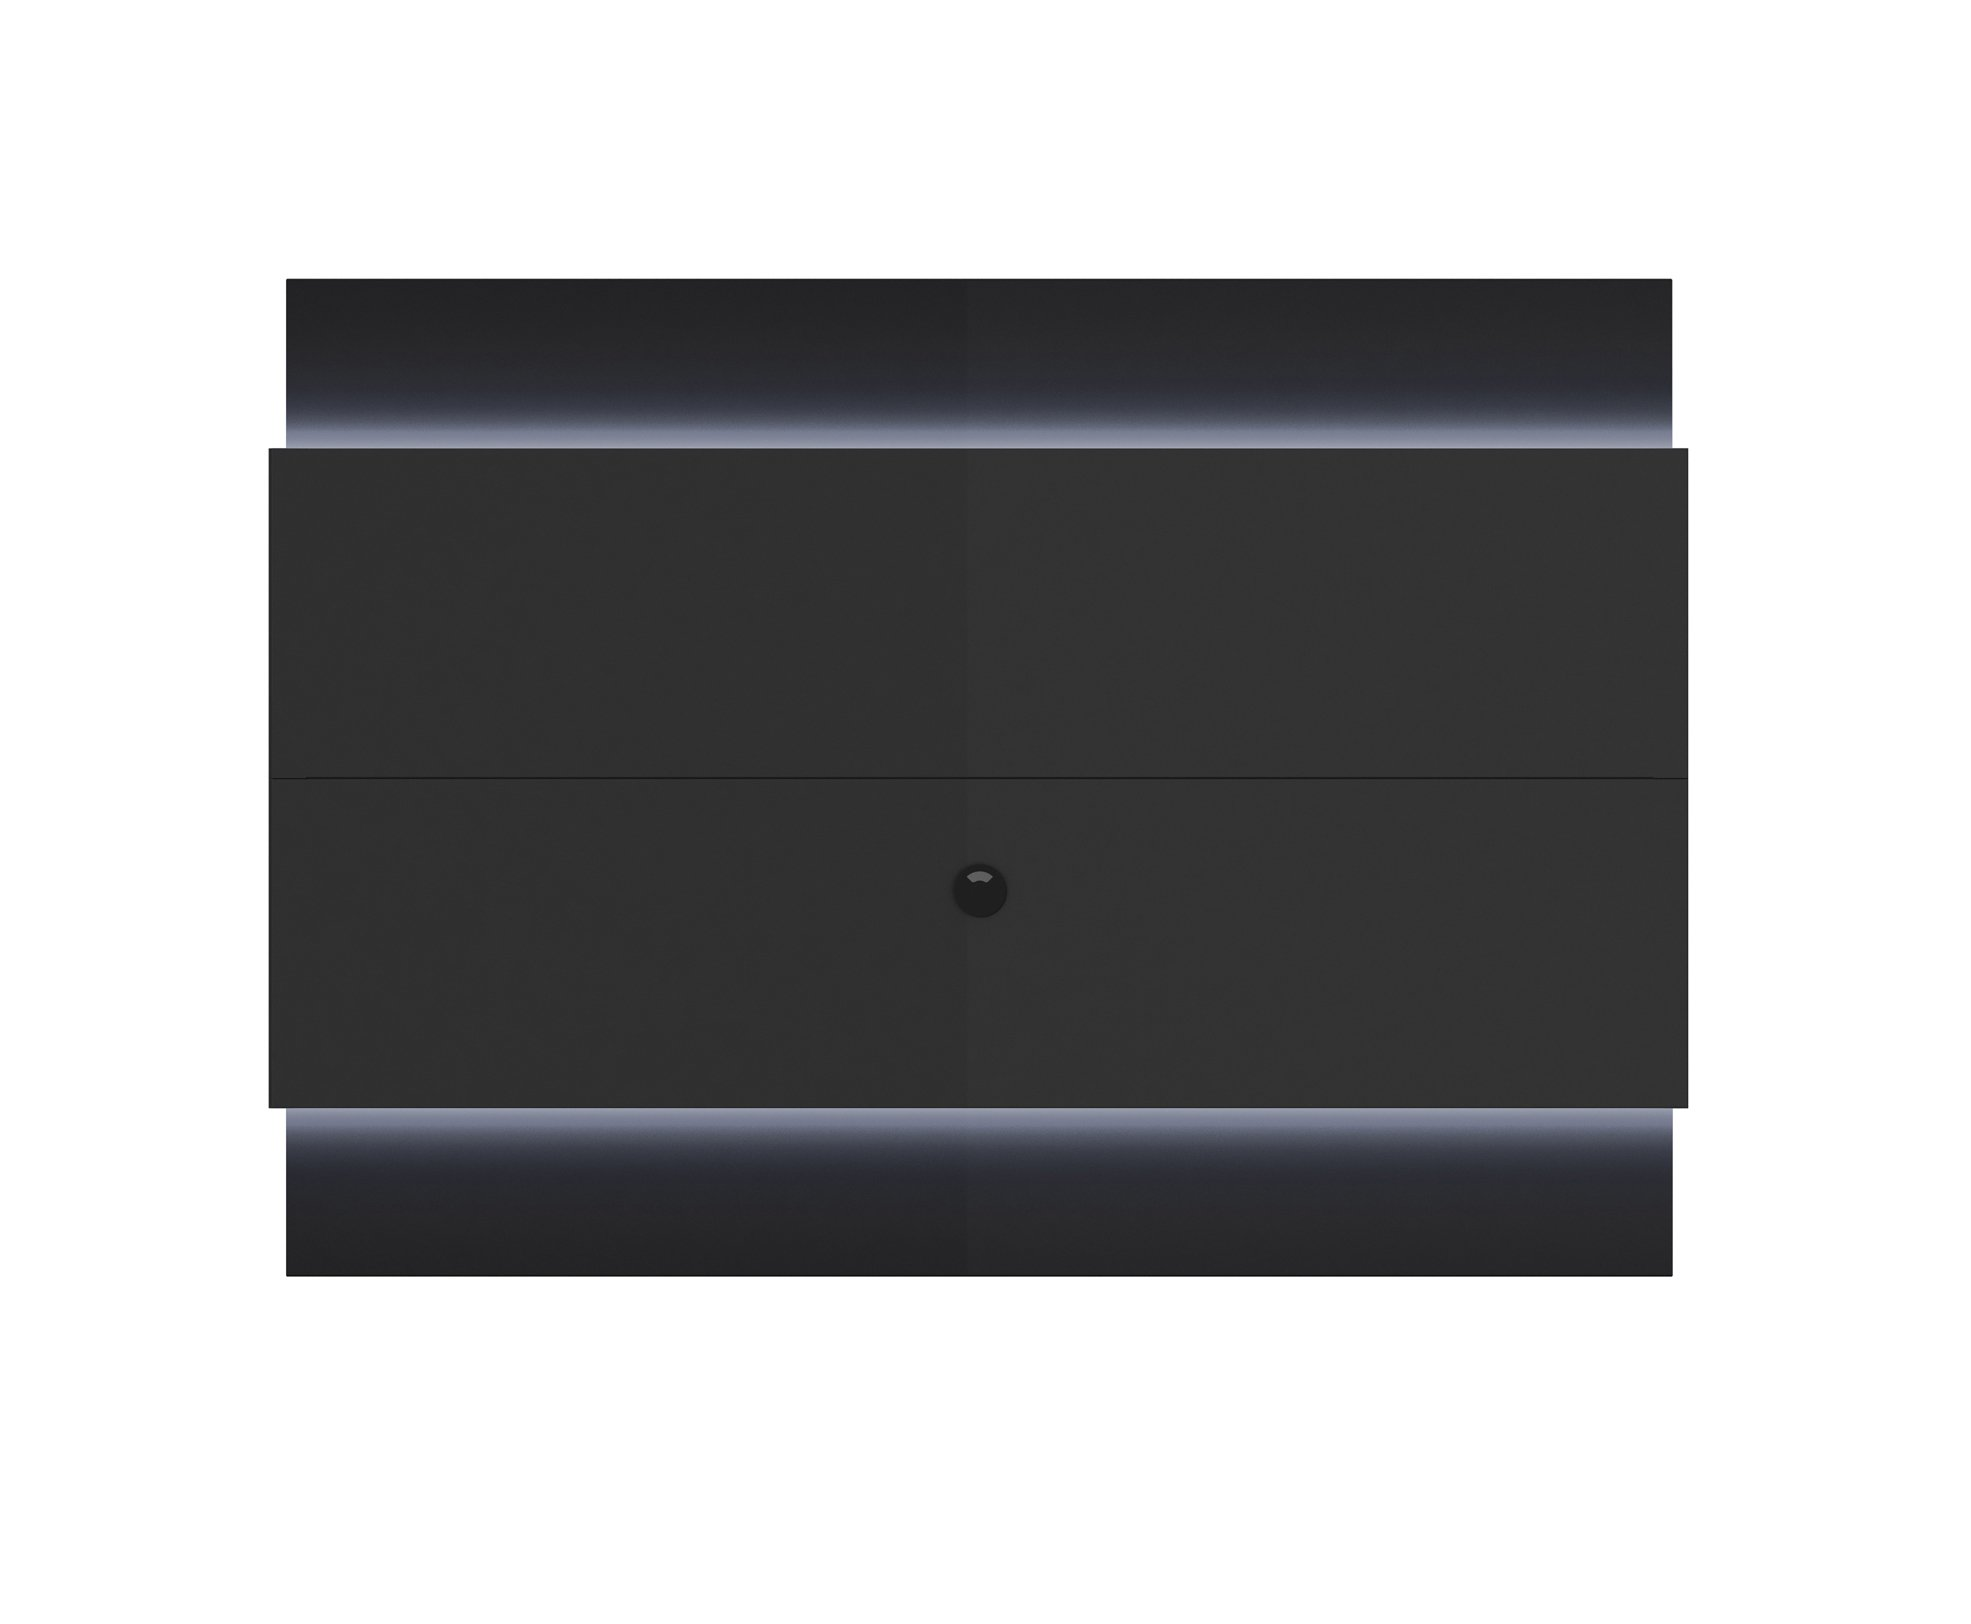 lincoln black gloss black matte floating wall tv panel 1 9 w led lights by manhattan comfort. Black Bedroom Furniture Sets. Home Design Ideas